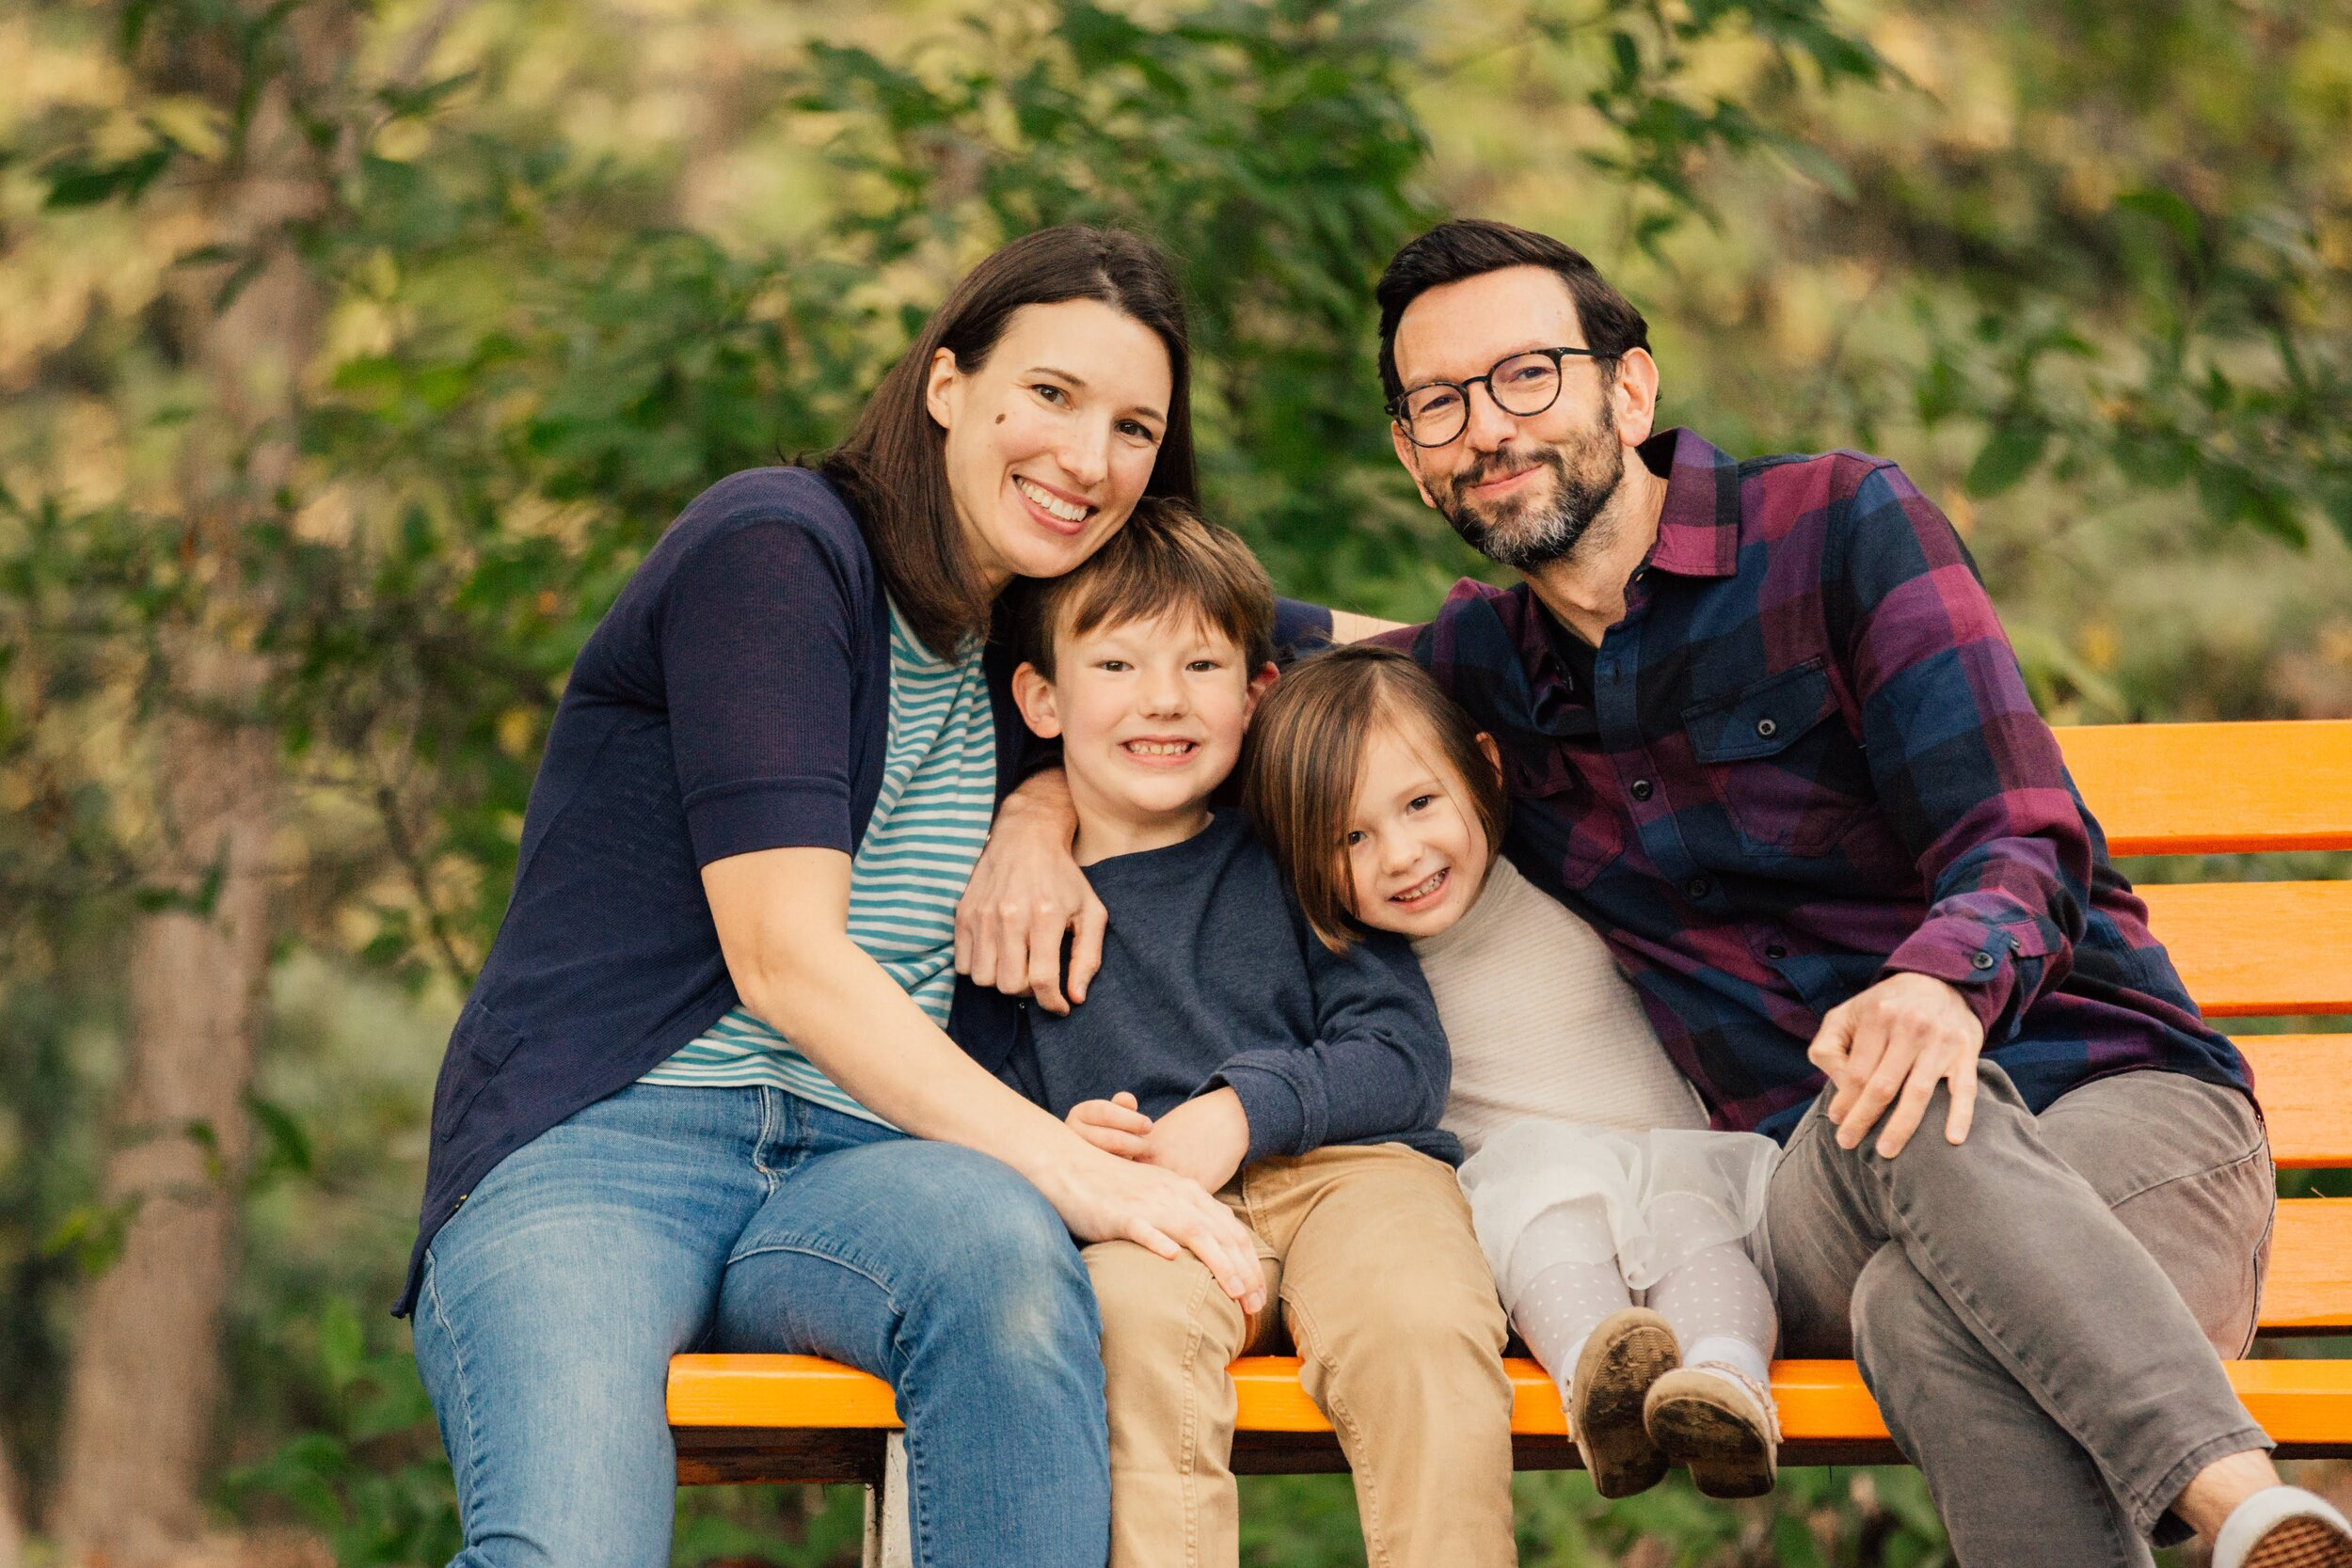 2019-10-29 Fields Family - Greenville, SC - Jack Robert Photography (9 of 158).jpg